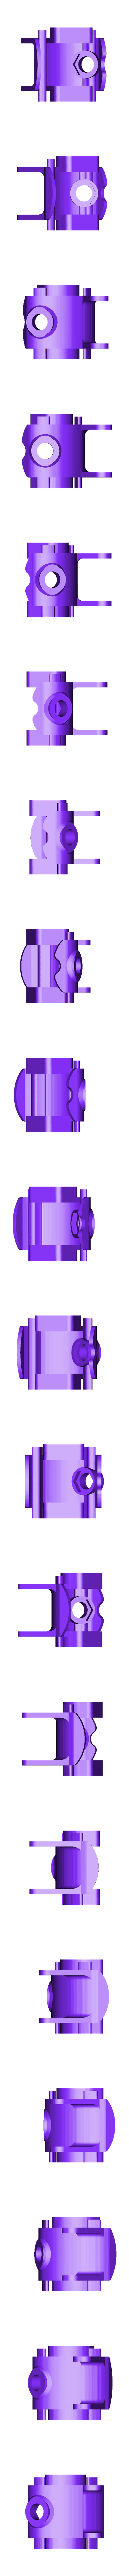 GepRC_CX2_Crossfire_Antenna_Mount.stl Download free STL file GEPRC CX2/CX3 (Cinepro 4K, Cineking, CineQueen) - Various Antenna Mounts and VTX • 3D printer design, rodrigosclosa